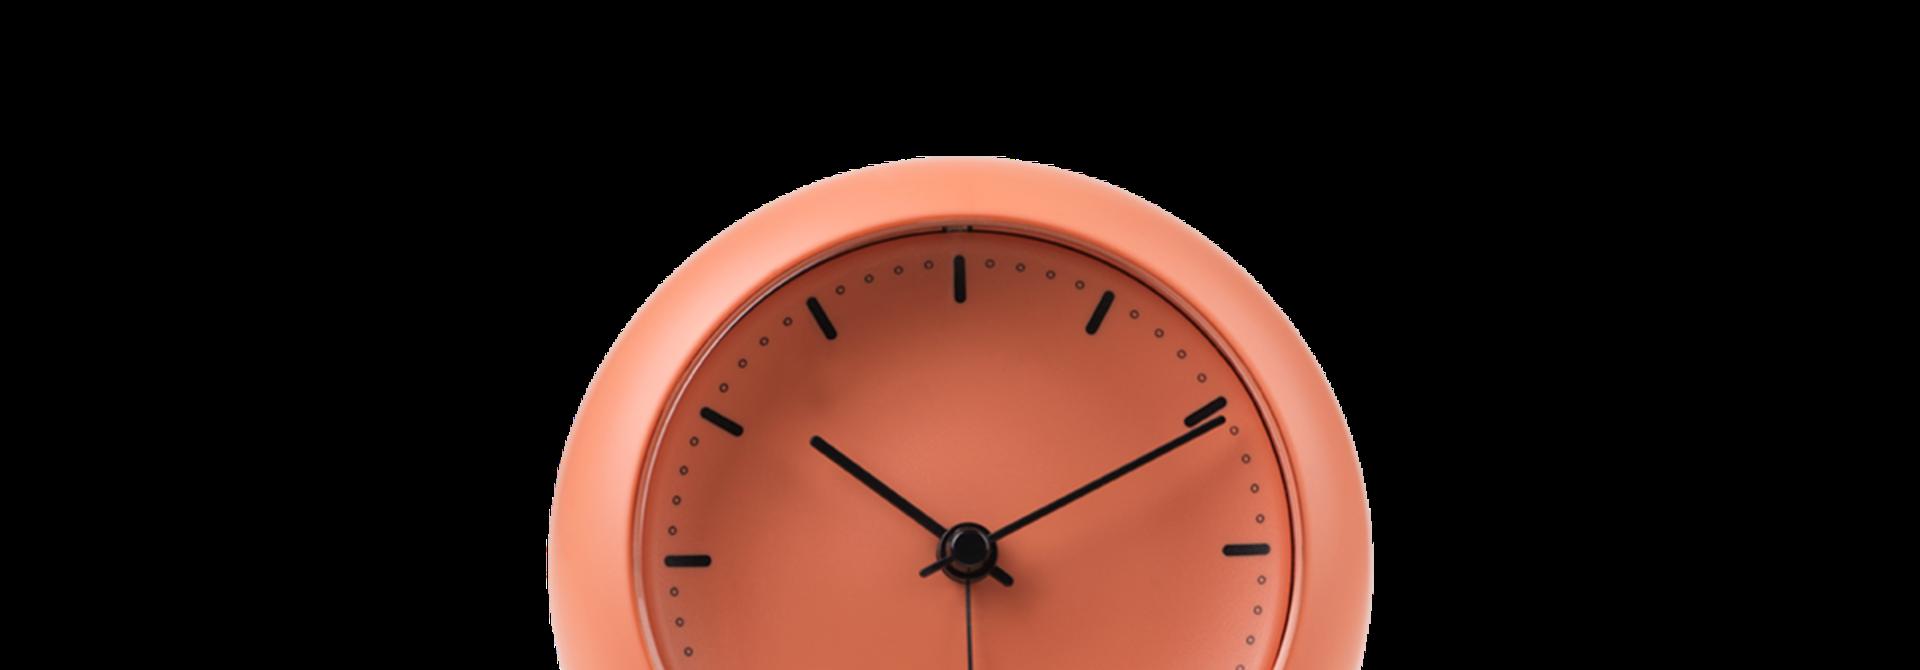 City Hall table clock